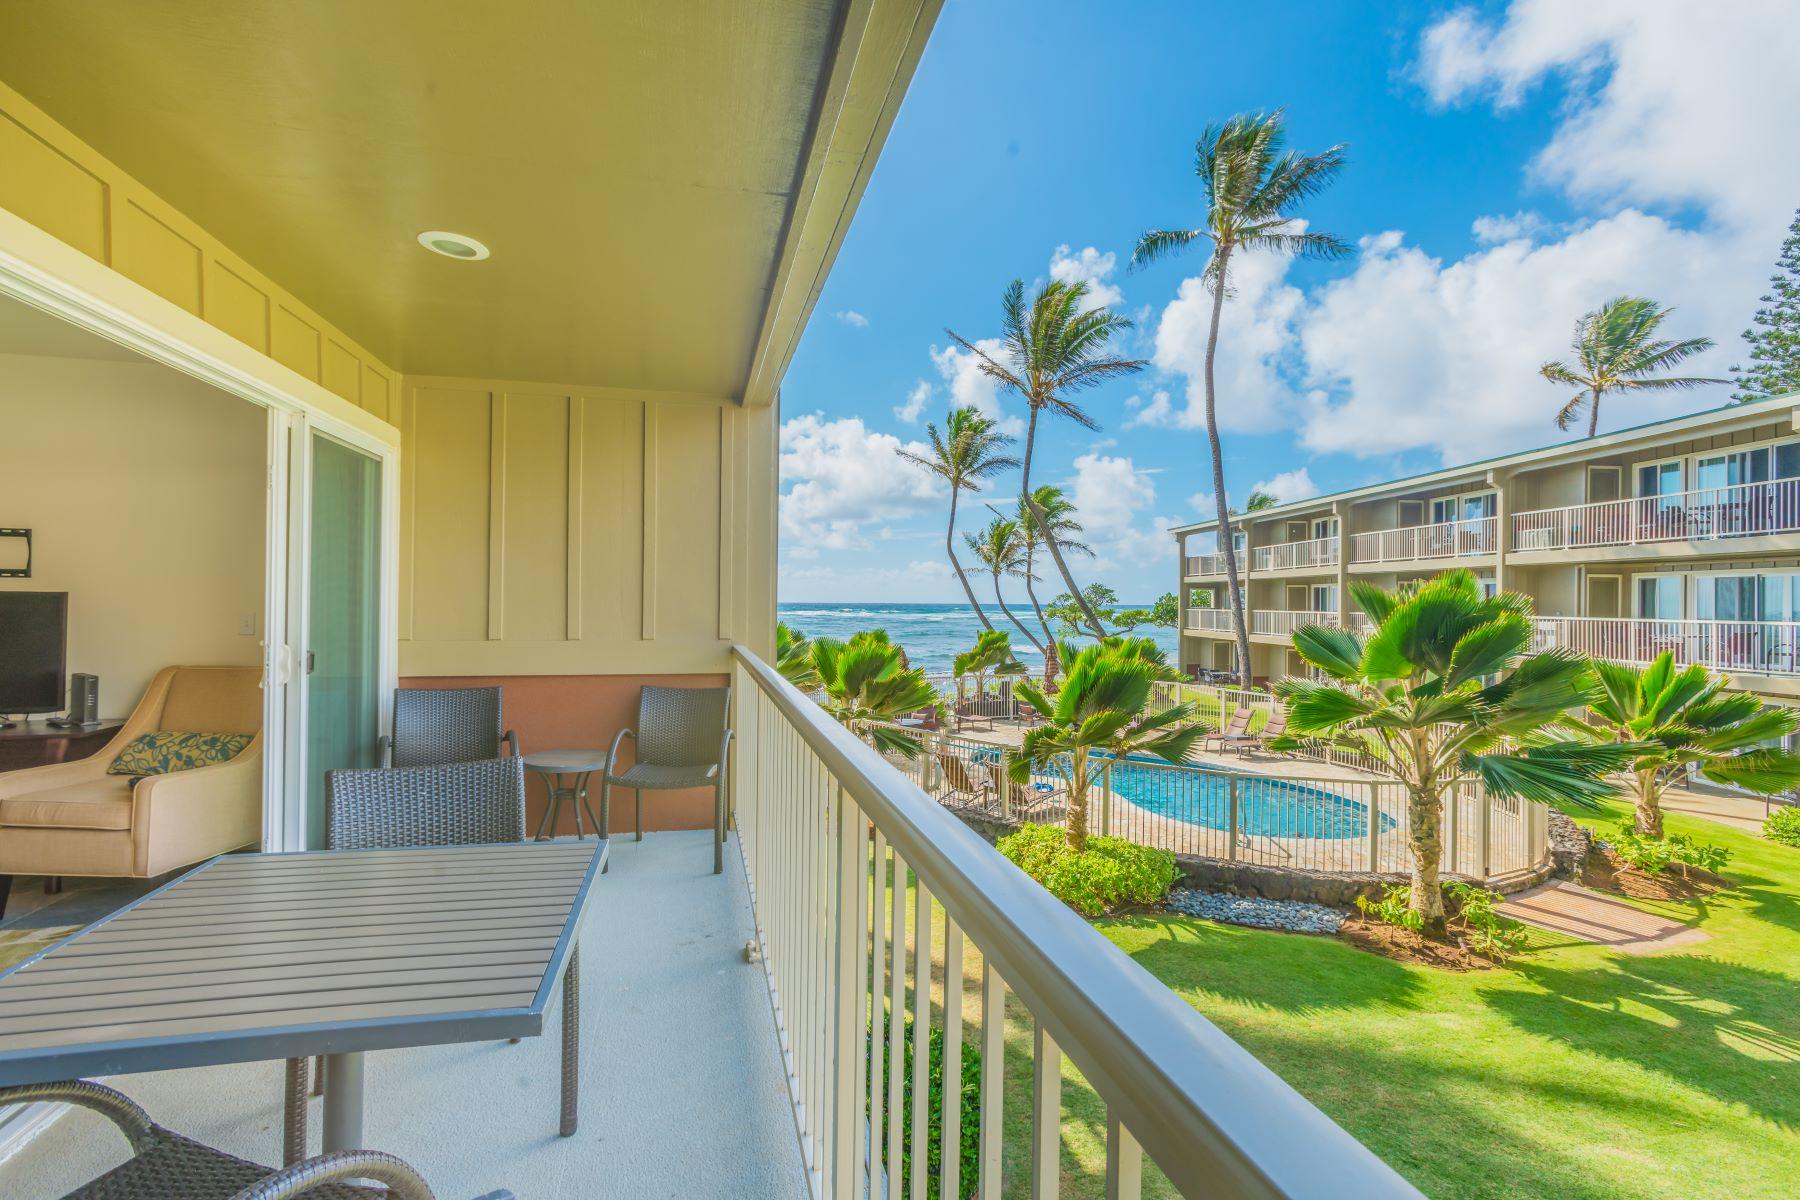 Condominiums για την Πώληση στο Kauai Kailani #212 4-856 Kuhio Highway #212, Kapaa, Χαβαη 96746 Ηνωμένες Πολιτείες